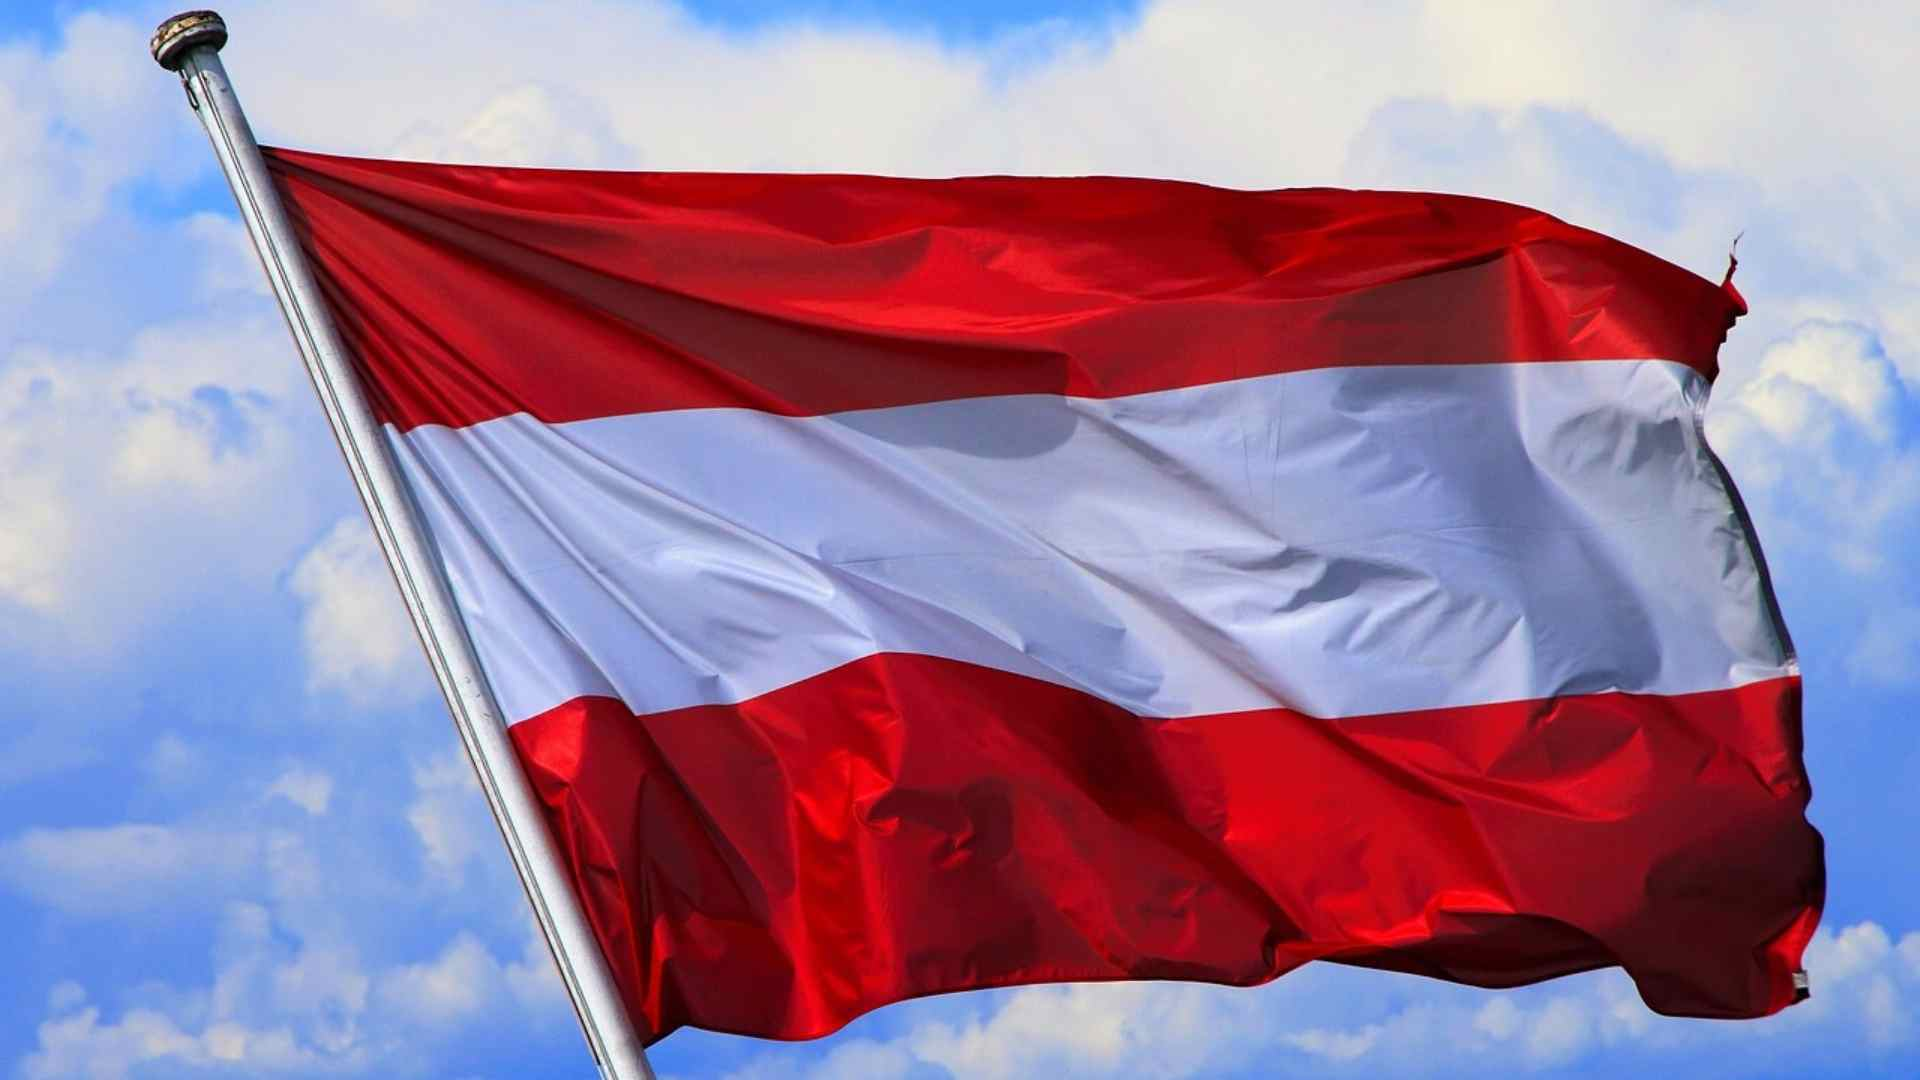 Austria v2.